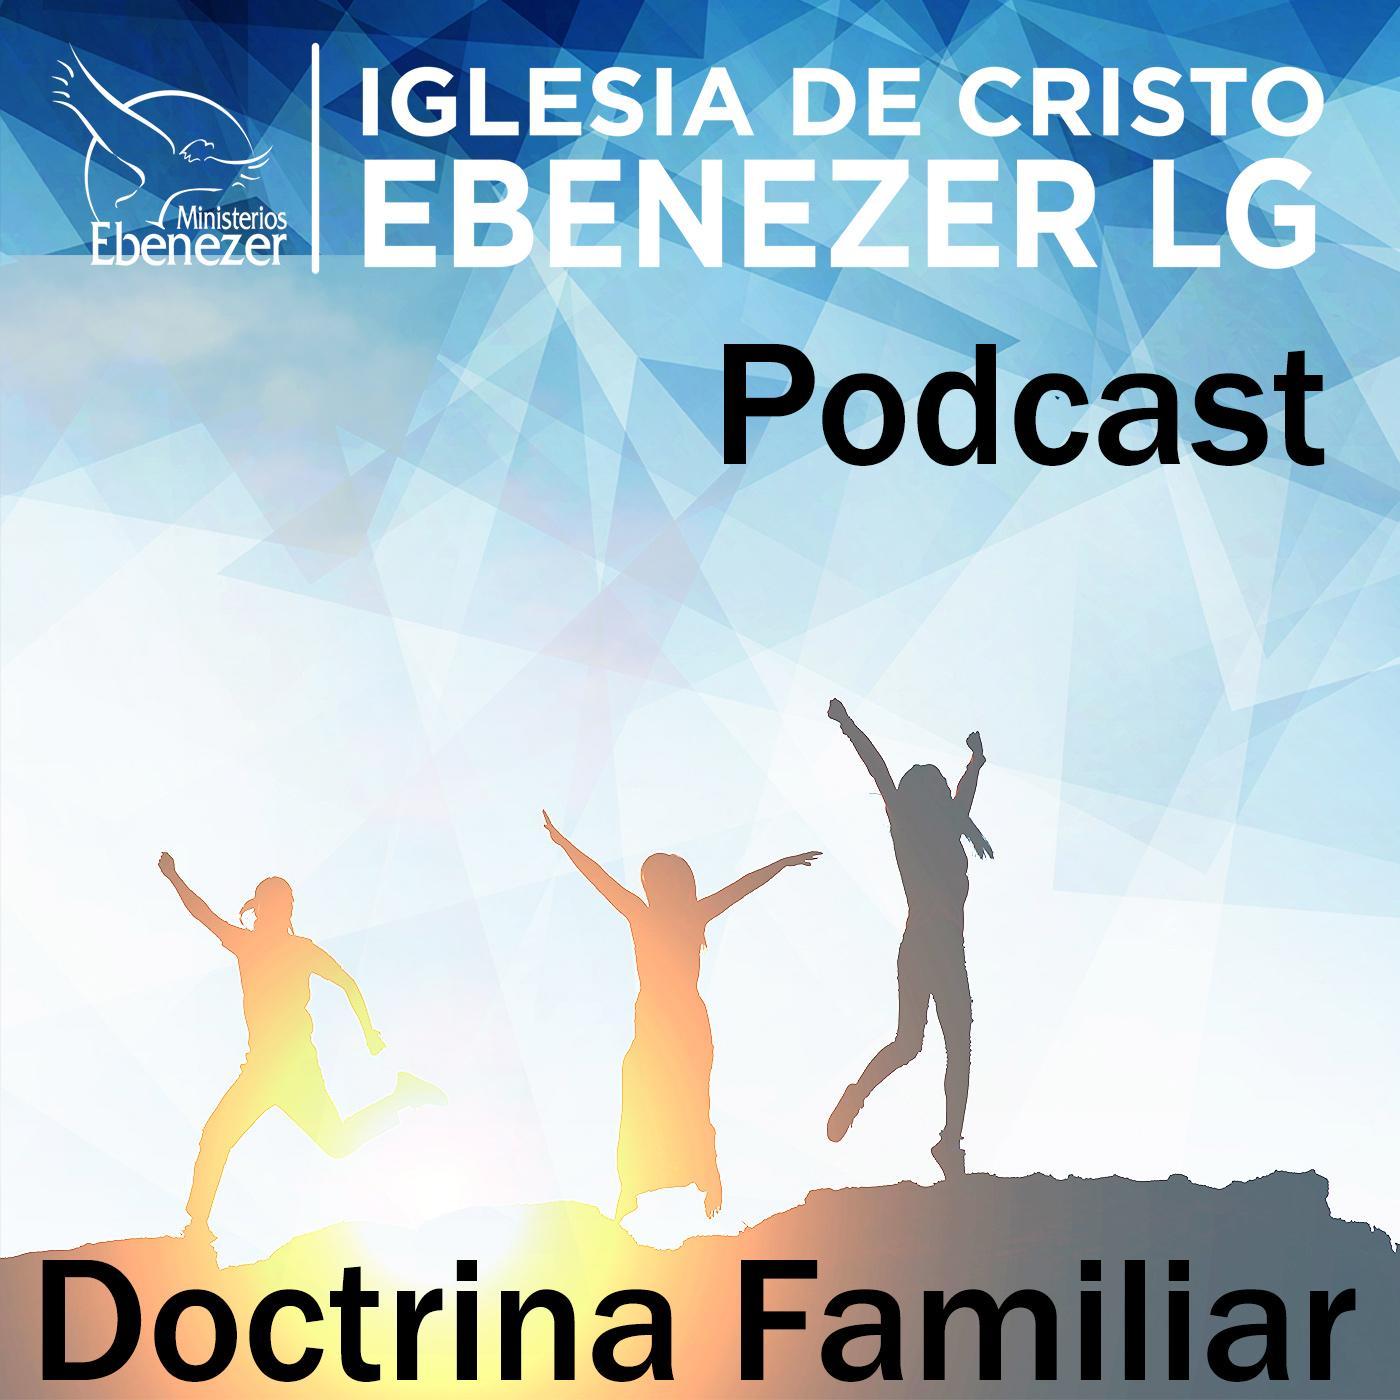 Doctrina Familiar (podcast) - Ebenezer LG   Listen Notes